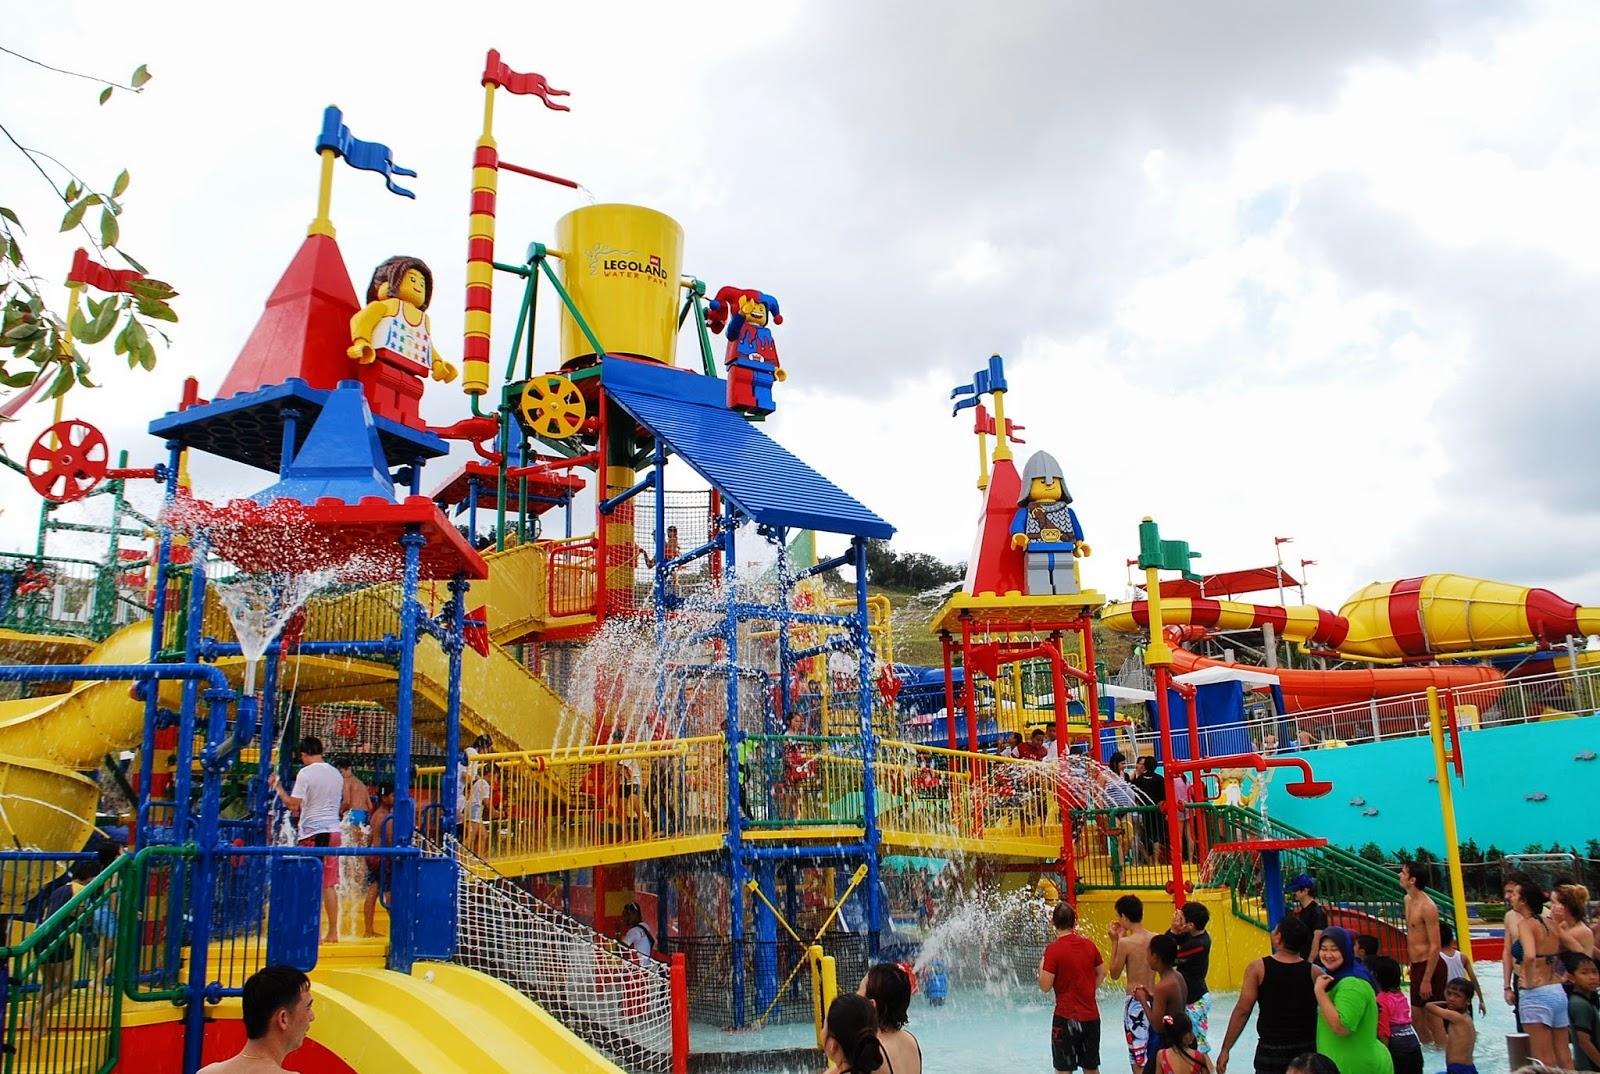 Legoland Water Park in Nusajaya, Johor